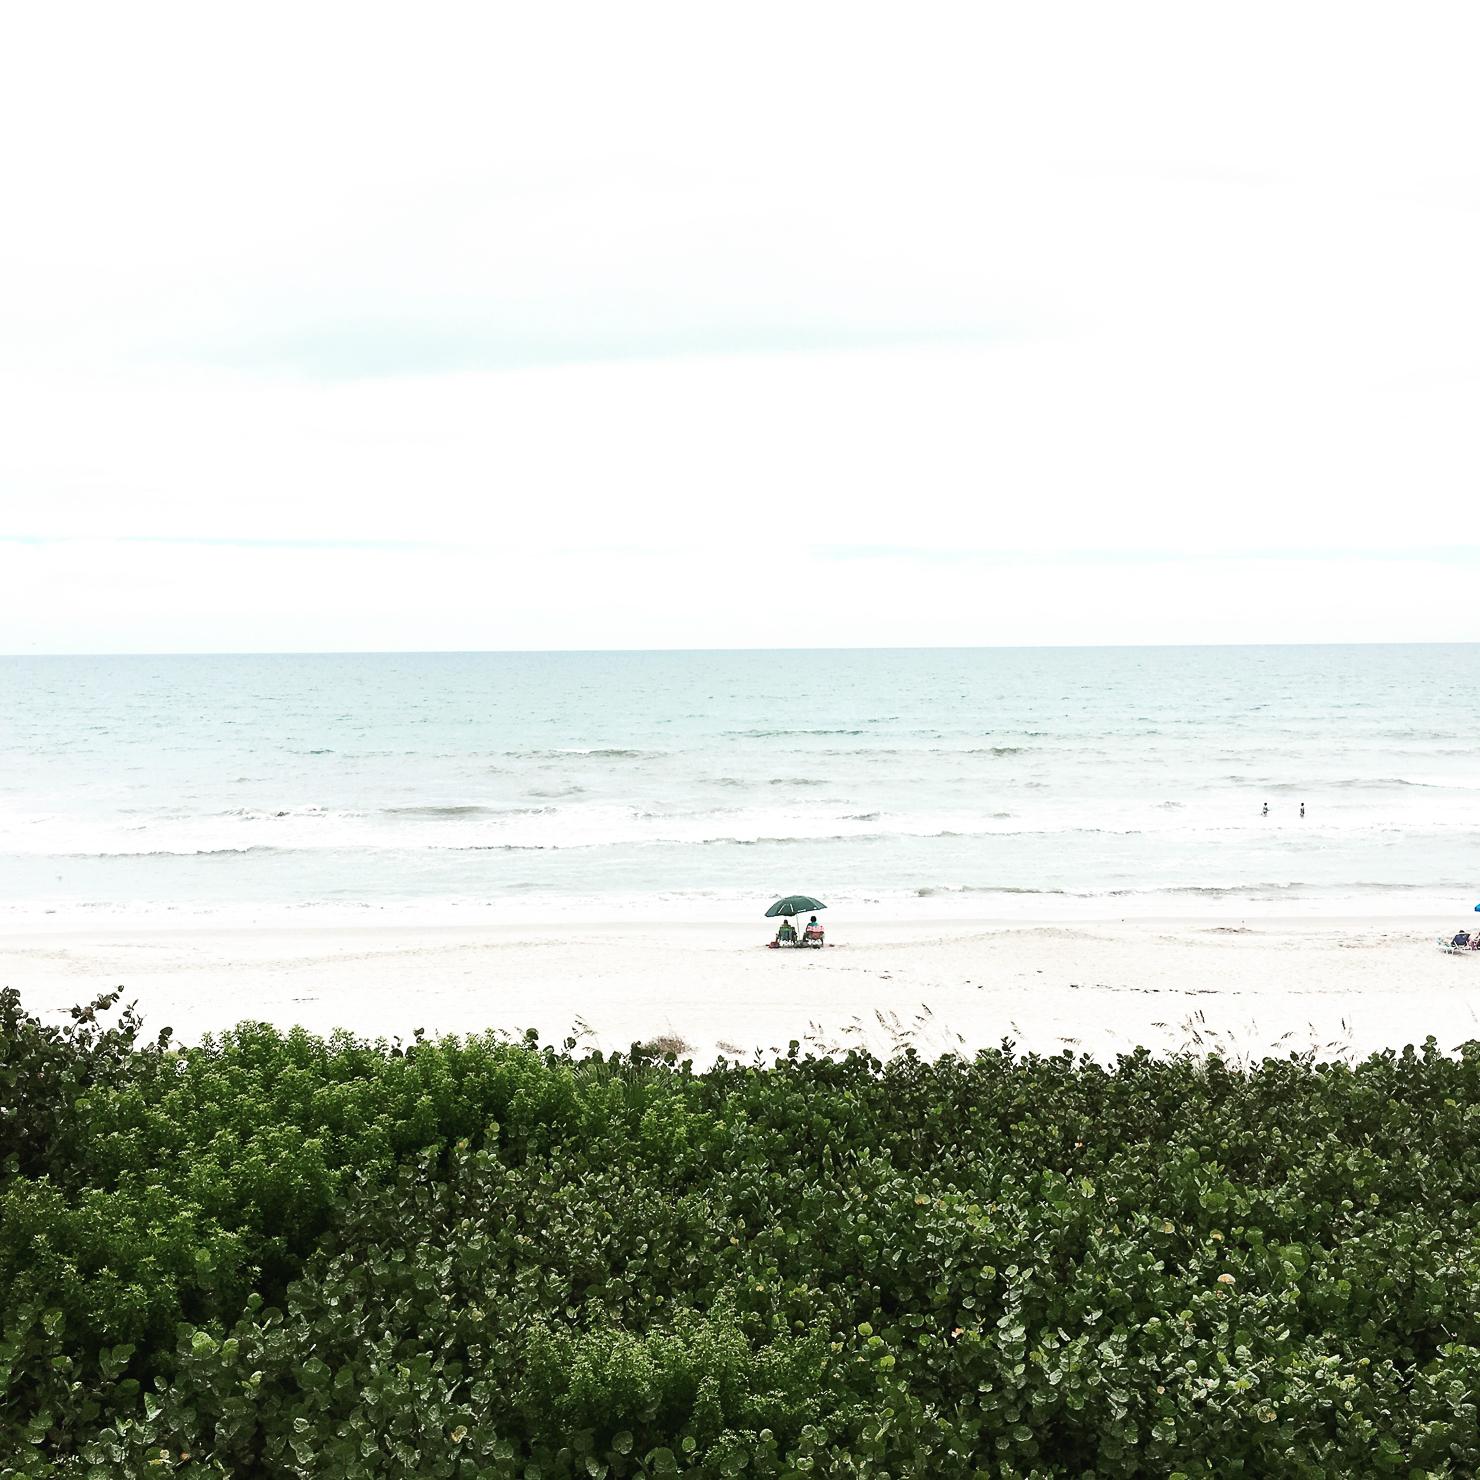 summer-vacation-melbourne-beach-melbourne-florida-